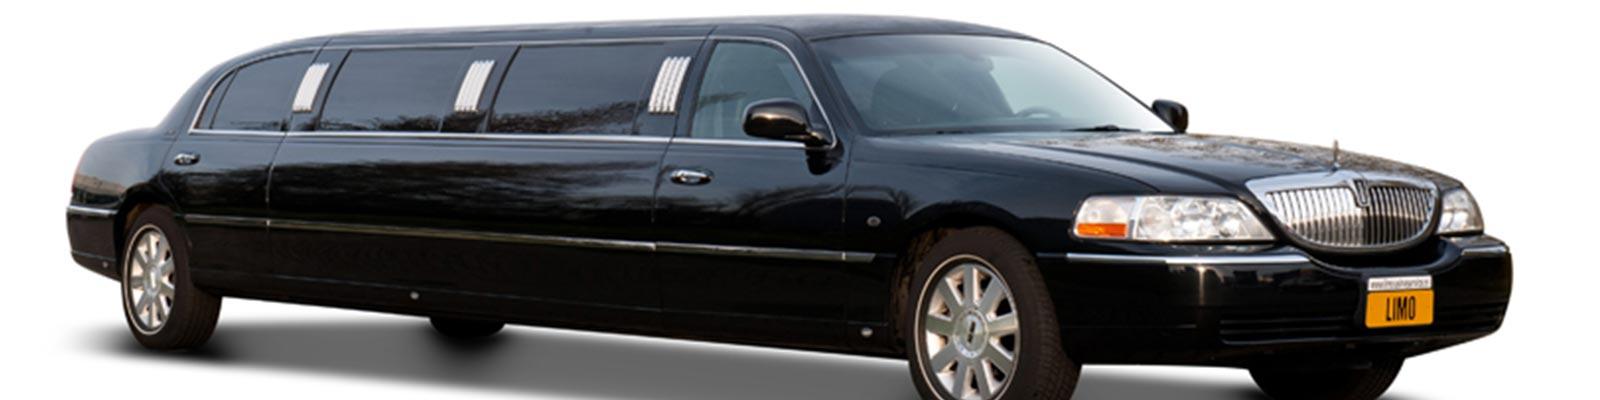 lincoln-limousine-zwart